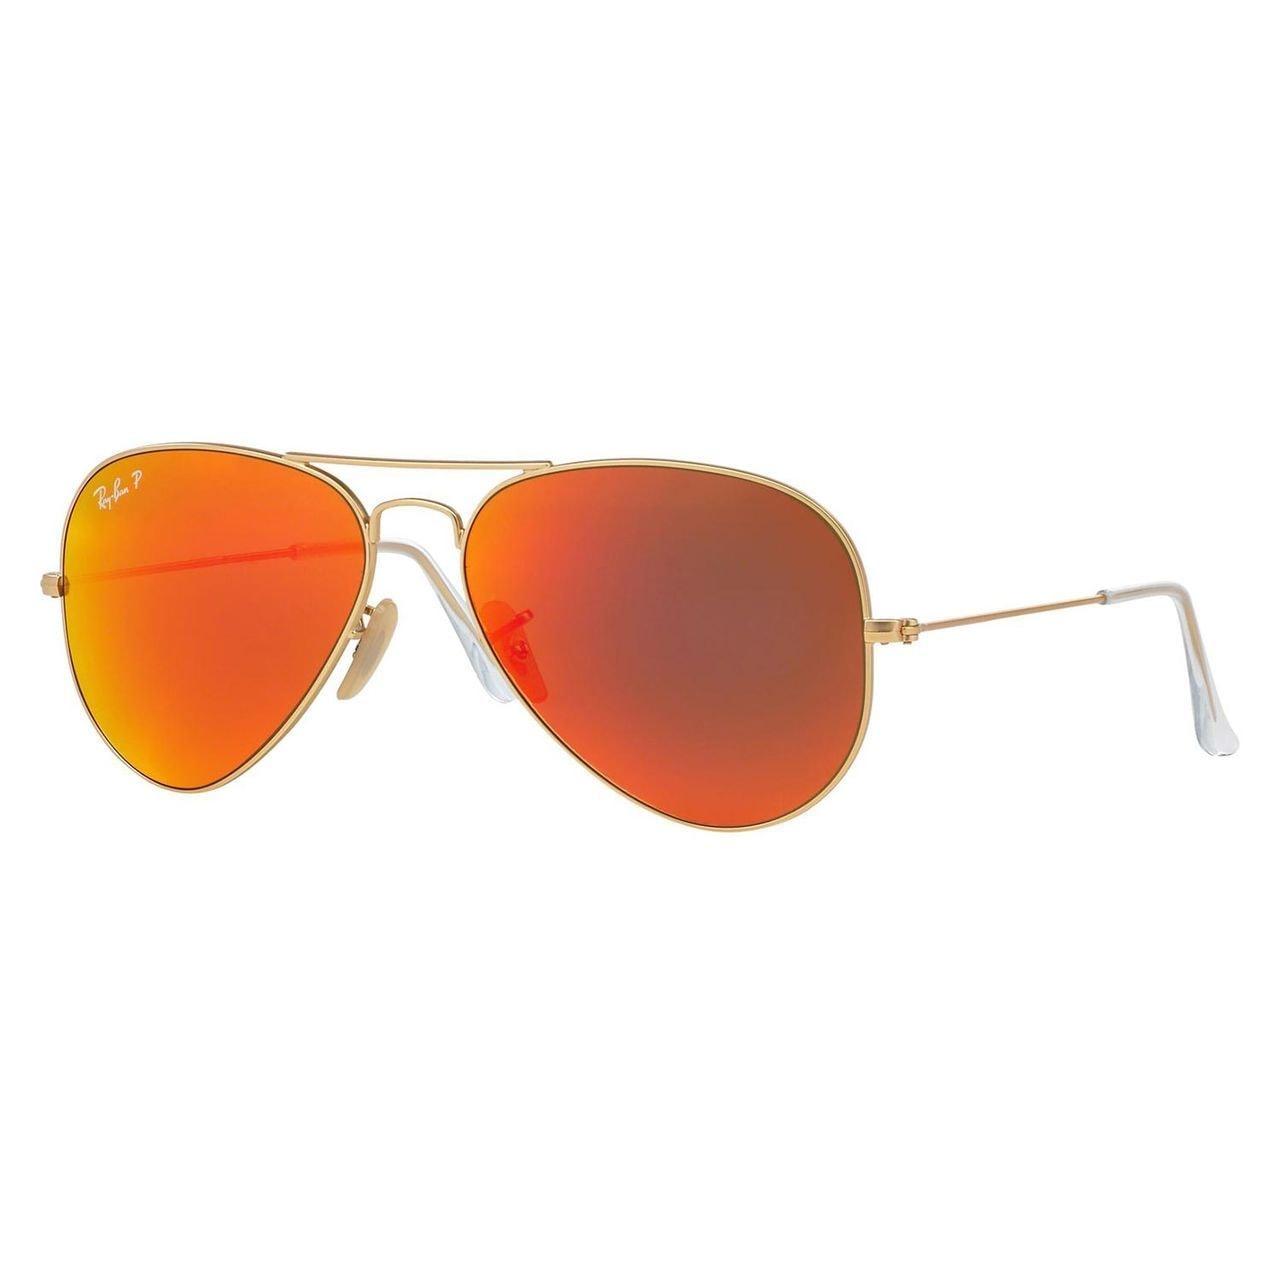 38e3605308b7 Ray-Ban Aviator RB3025 Unisex Gold Frame Orange Flash Polarized Lens  Sunglasses